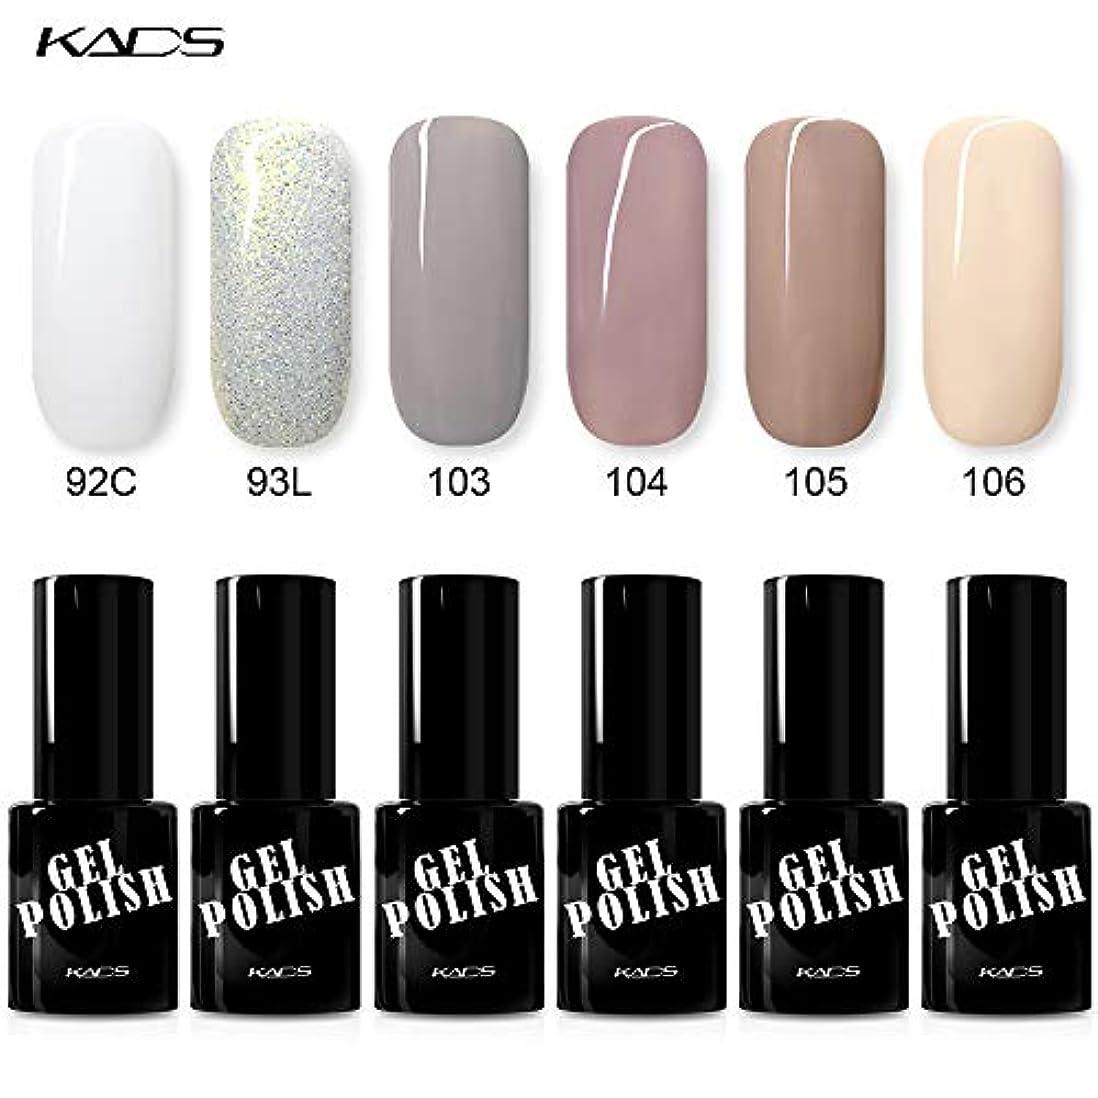 KADS ジェルネイルカラー 6色入り カラージェル 9.5ML UV?LED対応 ホワイト/ラメシルバー/カーキ/ベージュ